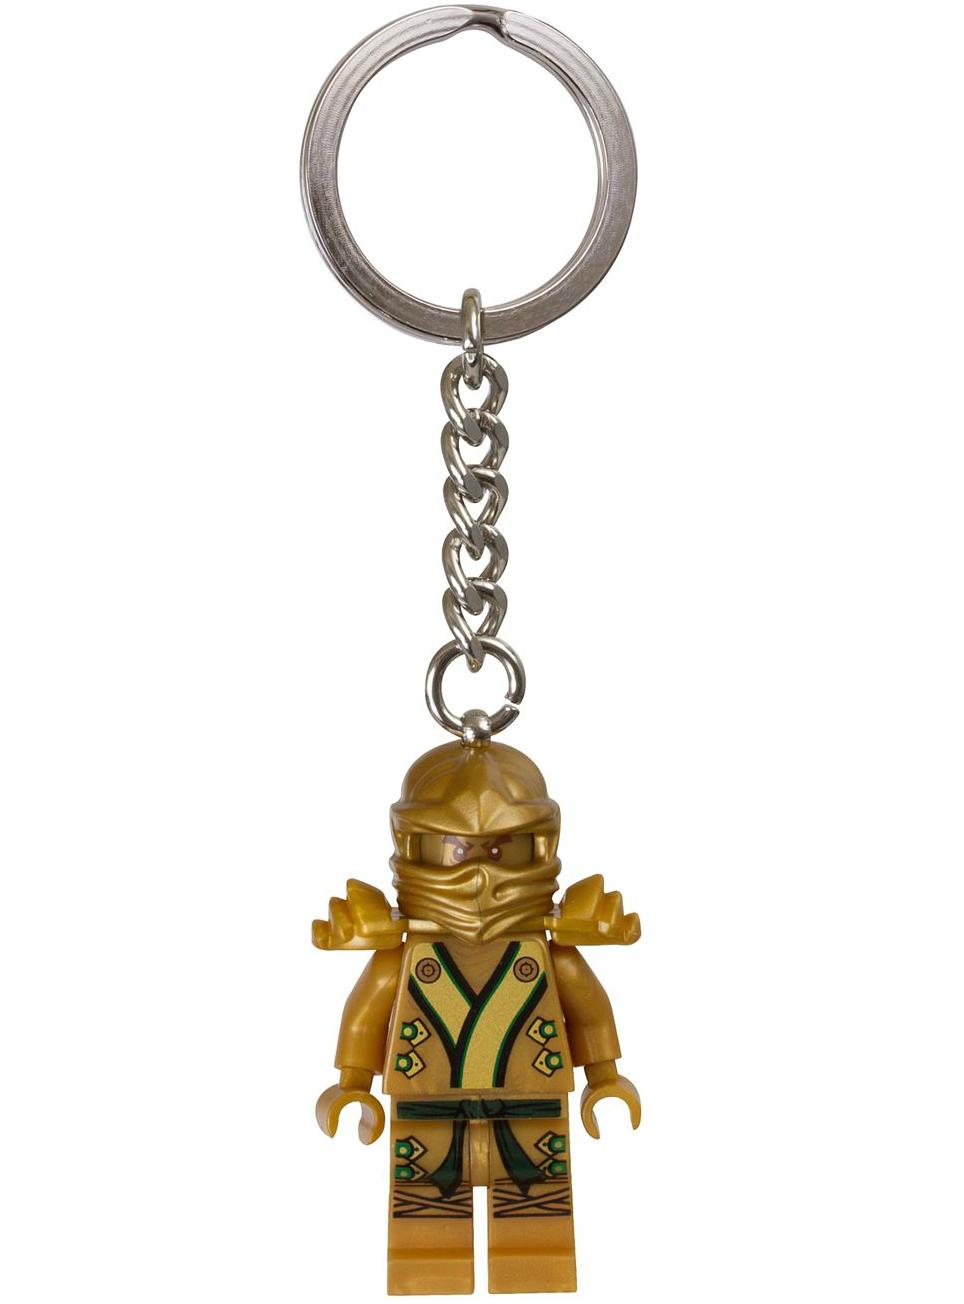 Worksheet. 850622 Golden Ninja Key Chain  Ninjago Wiki  FANDOM powered by Wikia